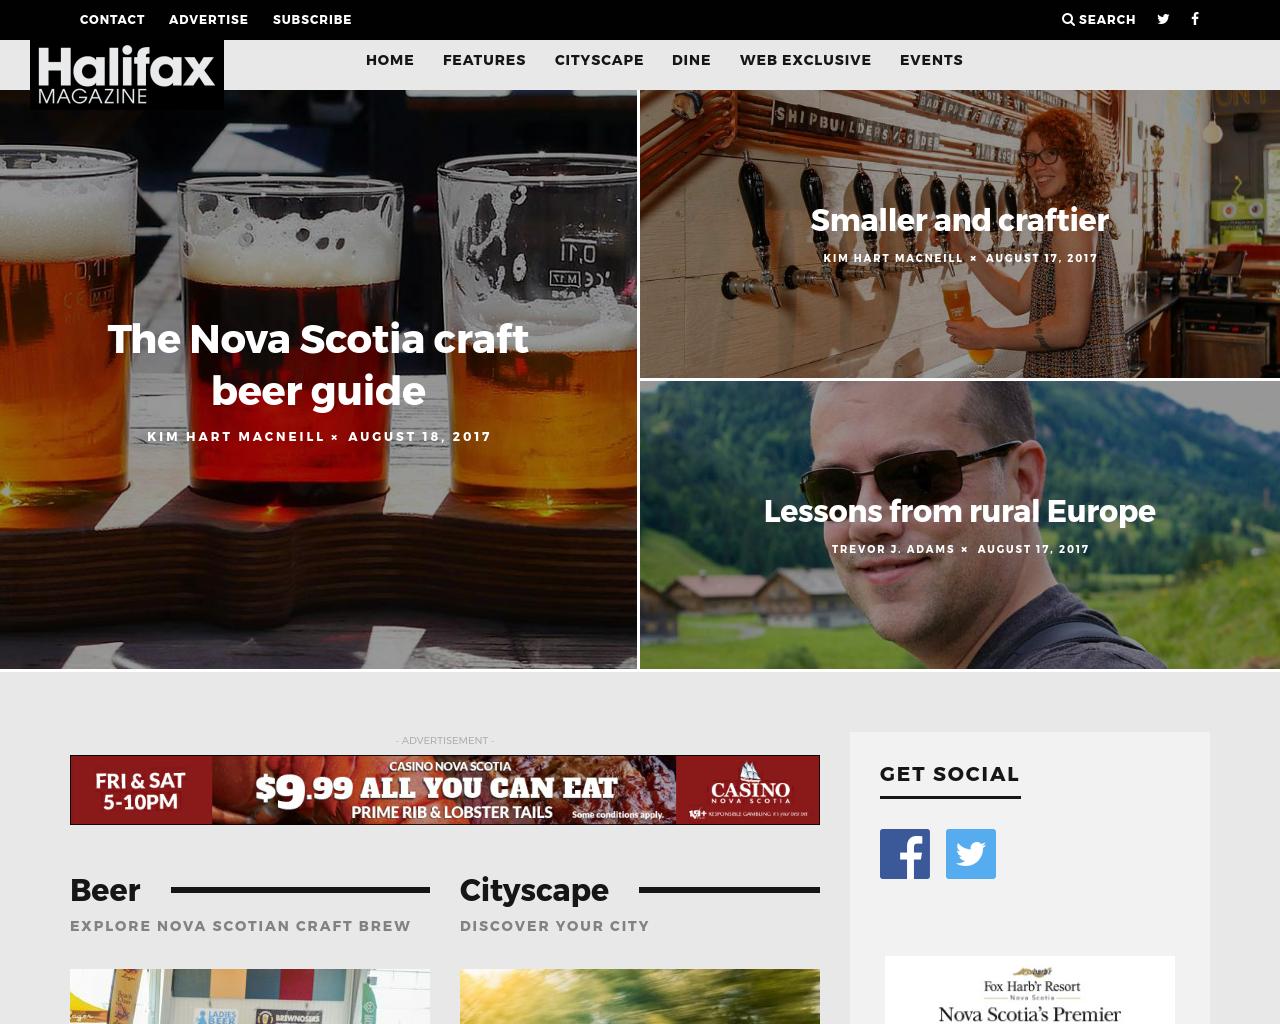 Halifax-Magazine-Advertising-Reviews-Pricing